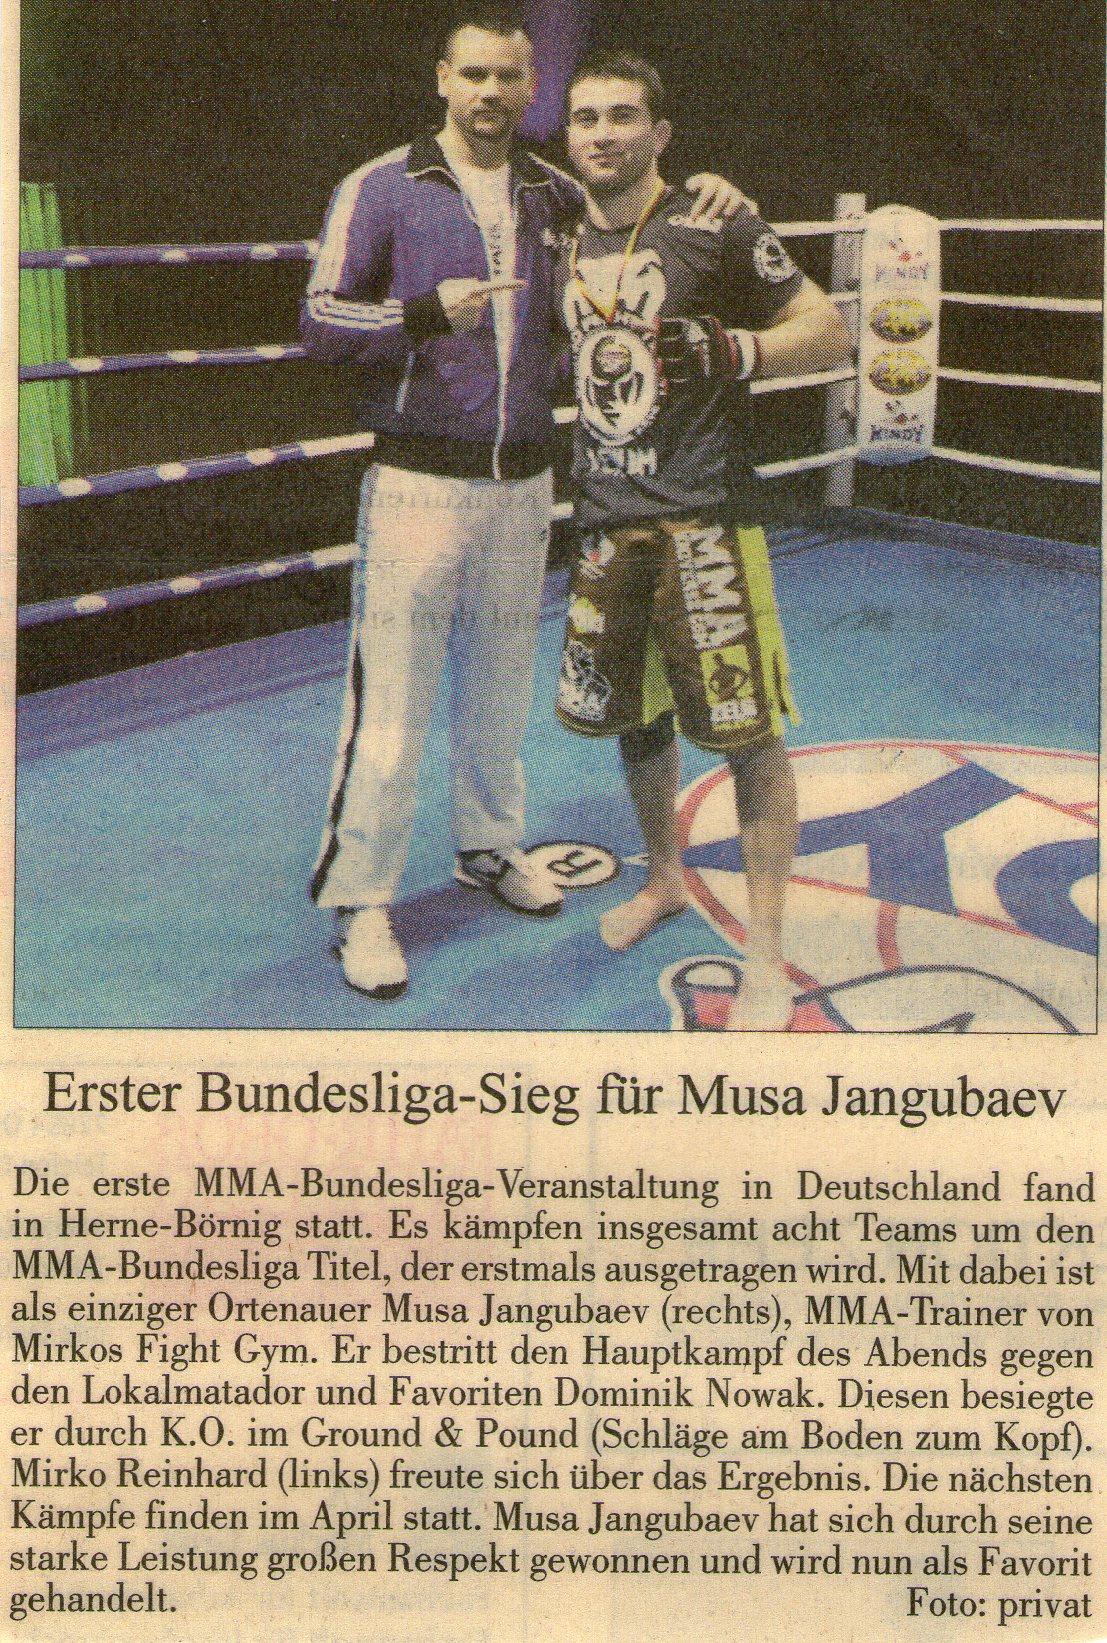 Erster Bundesliga-Sieg für Musa Jangubaev